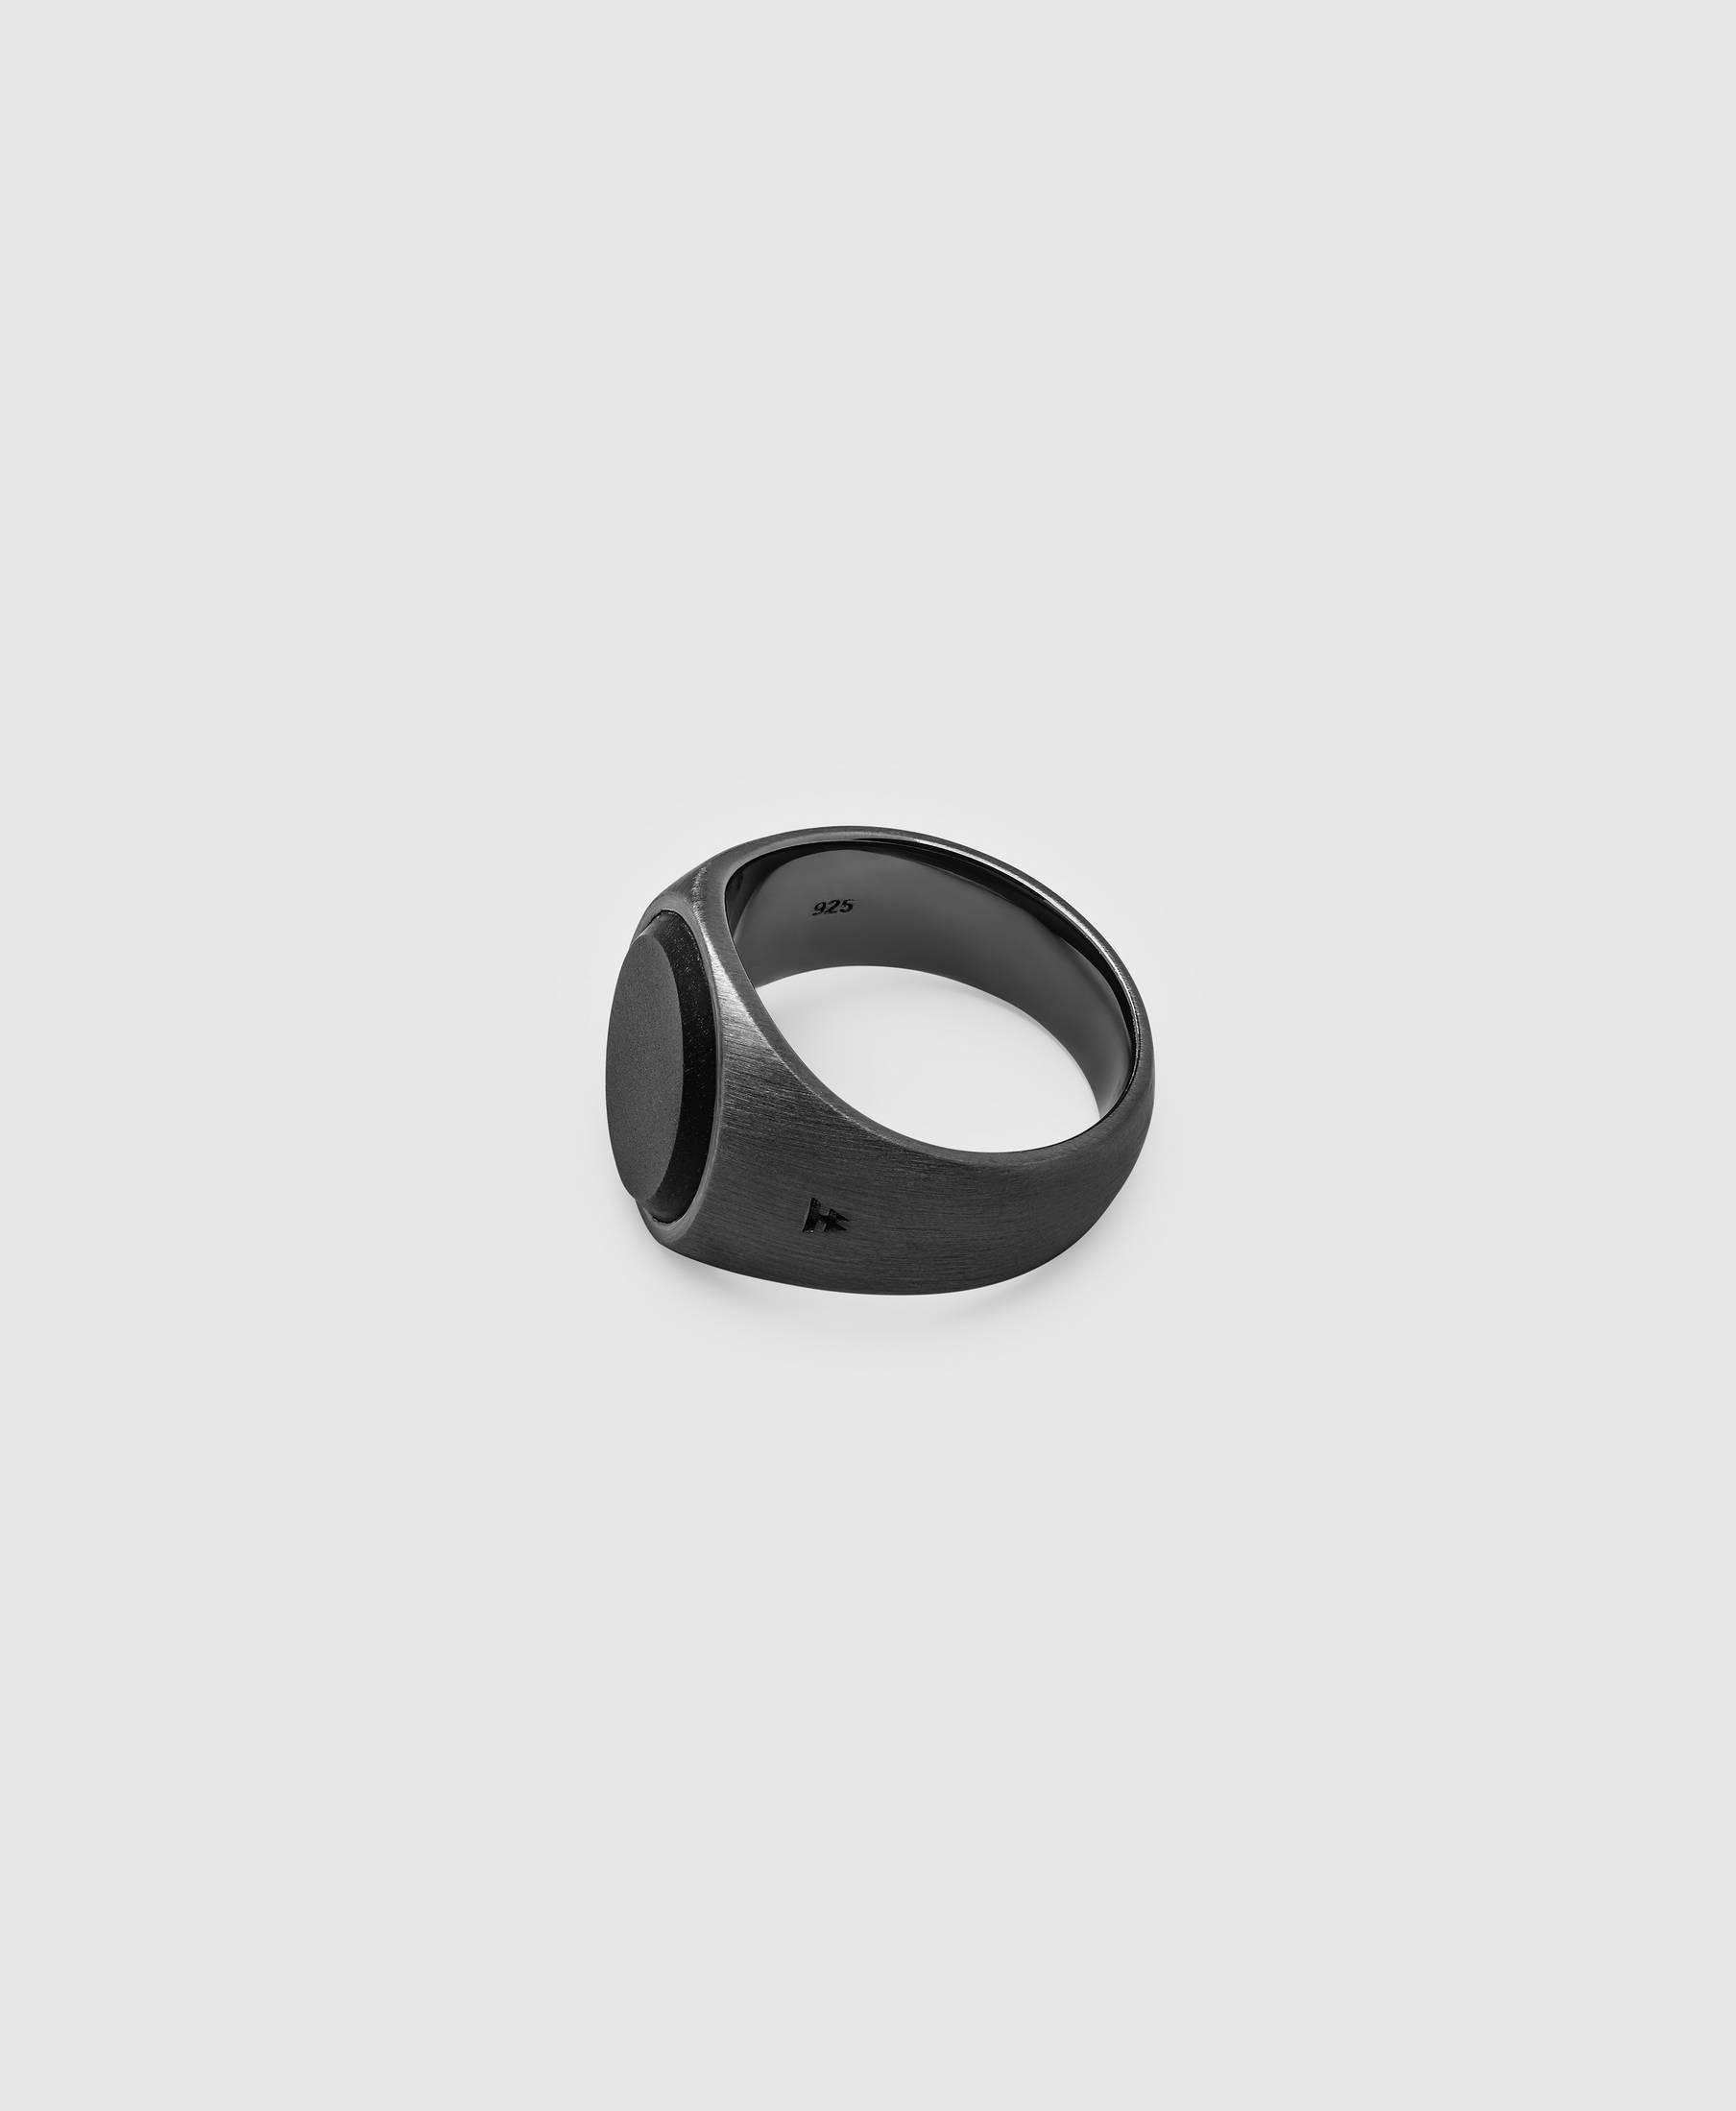 Oval Black Onyx BLACK Edition